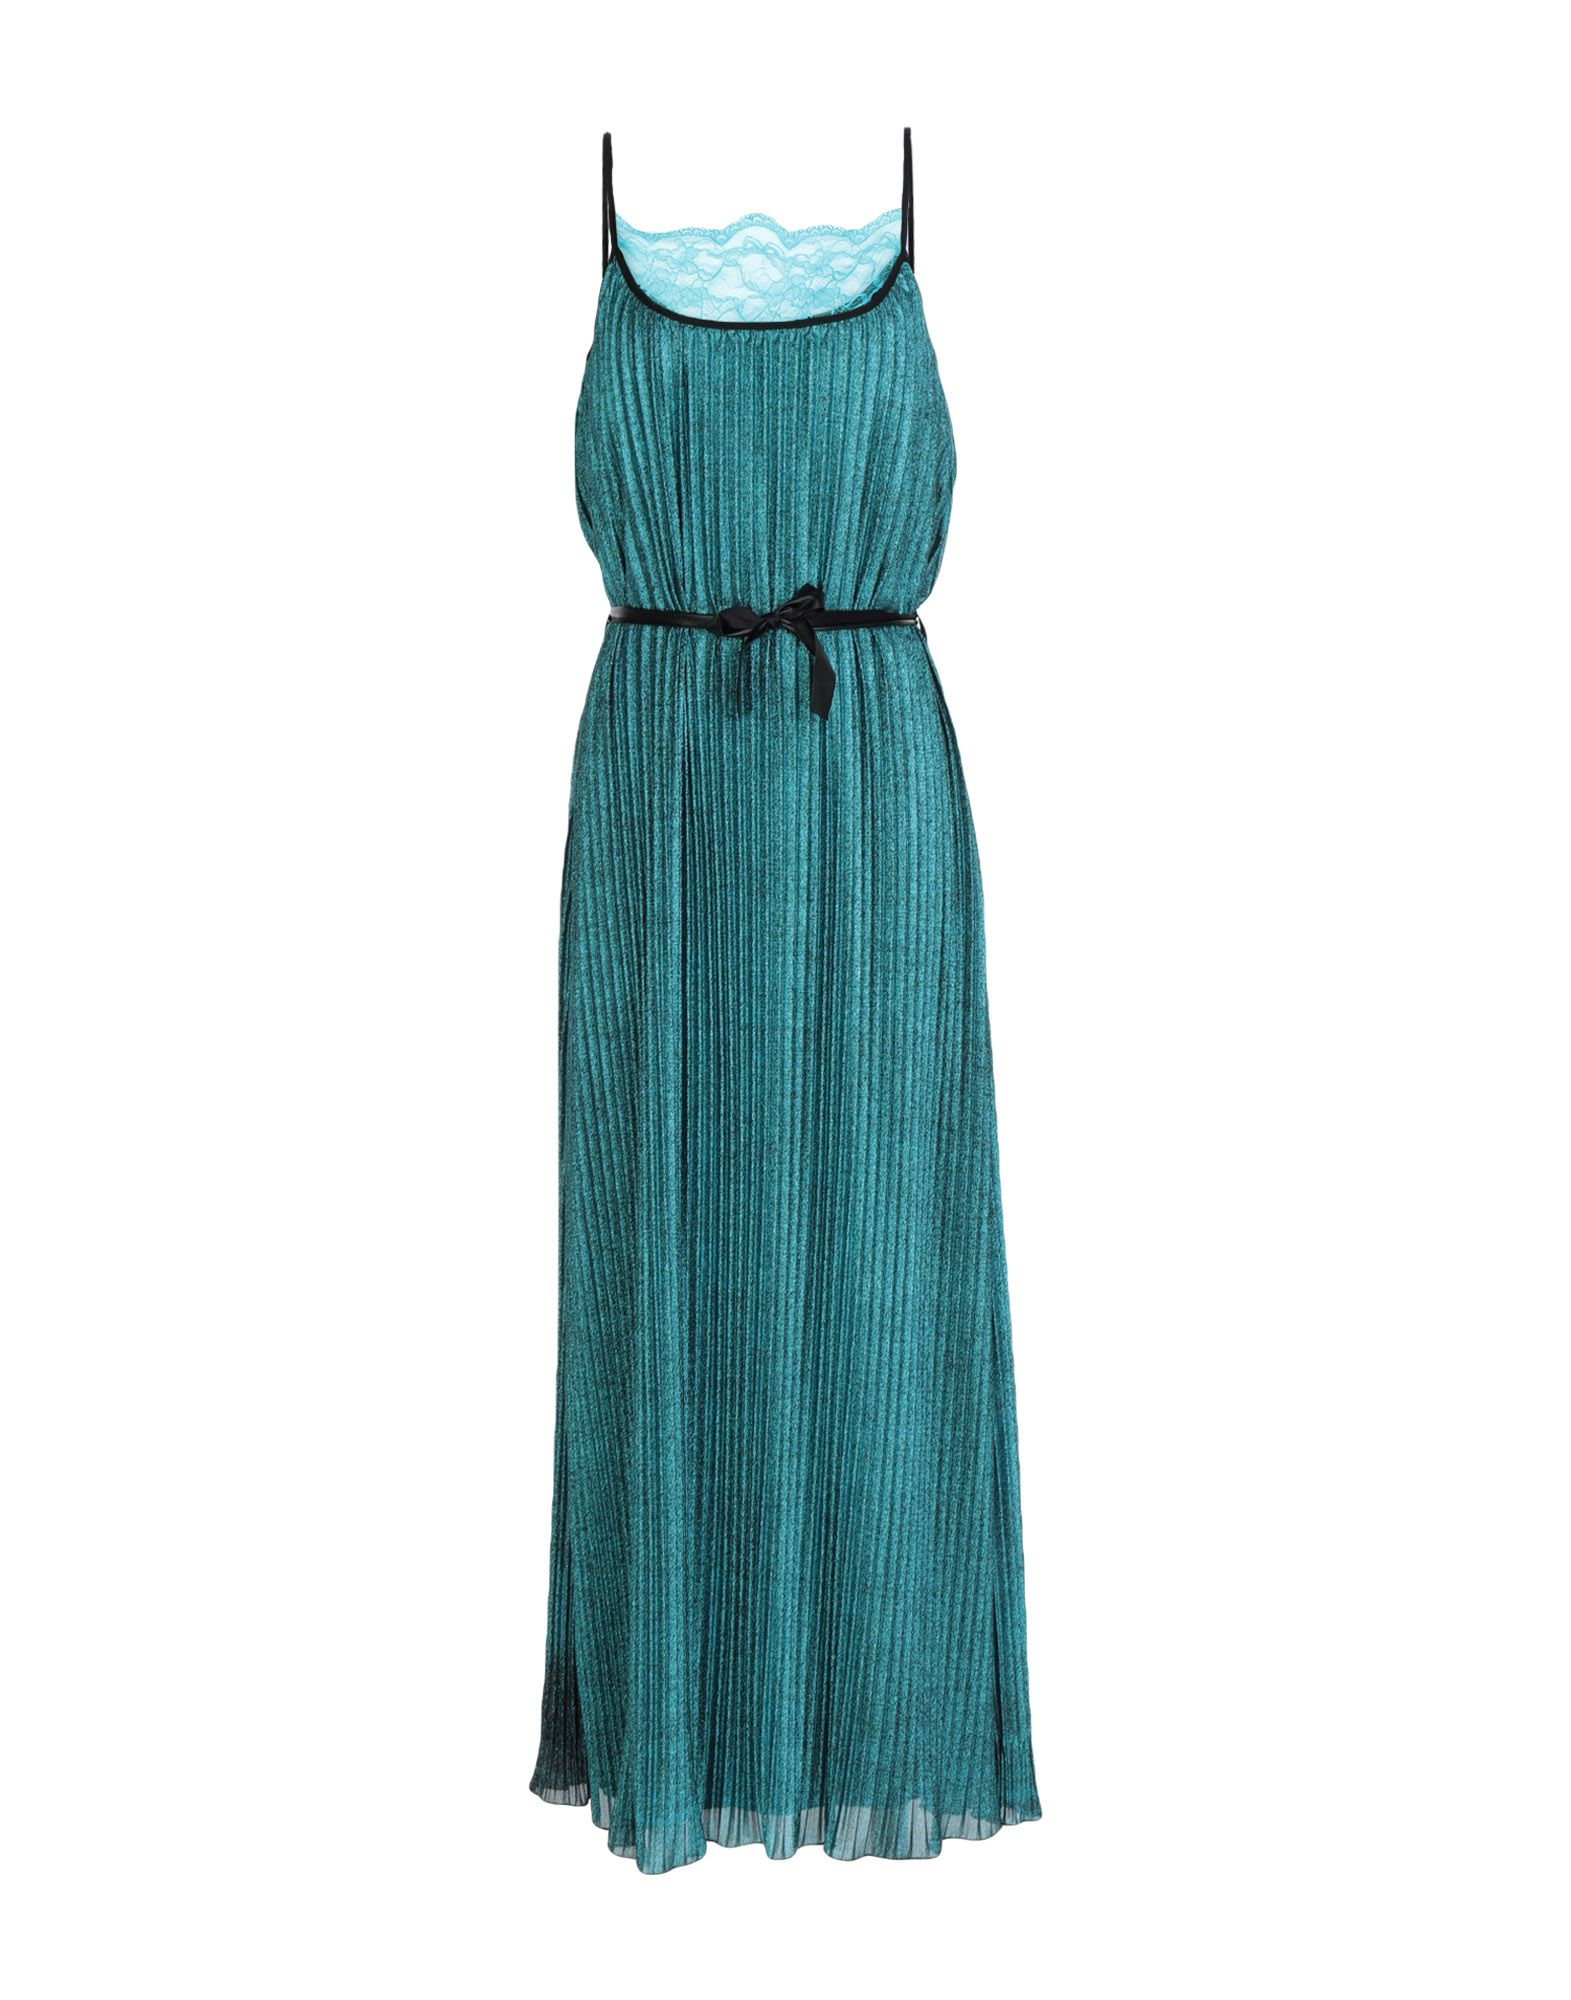 Vestito Vestito Lungo Siste' S donna - 34883953EX  Factory Outlet Online-Rabatt-Verkauf